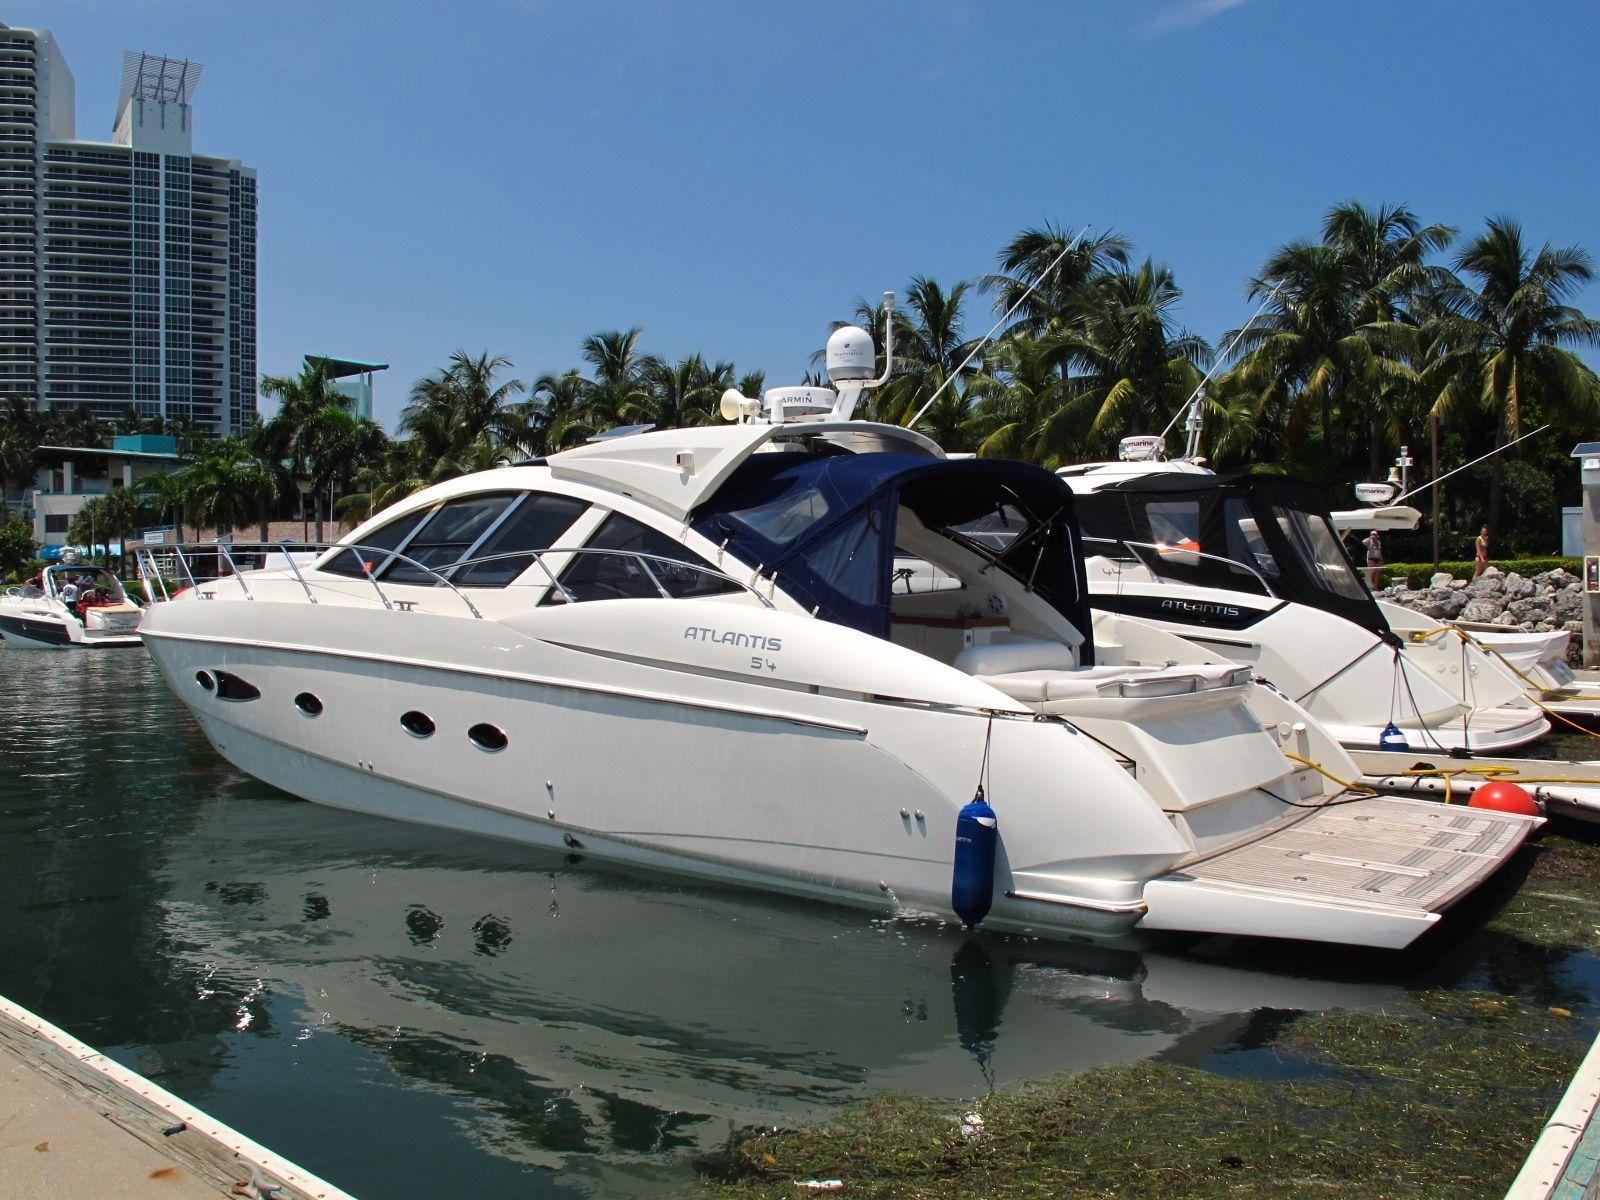 Atlantis Azimut 55', Miami Beach